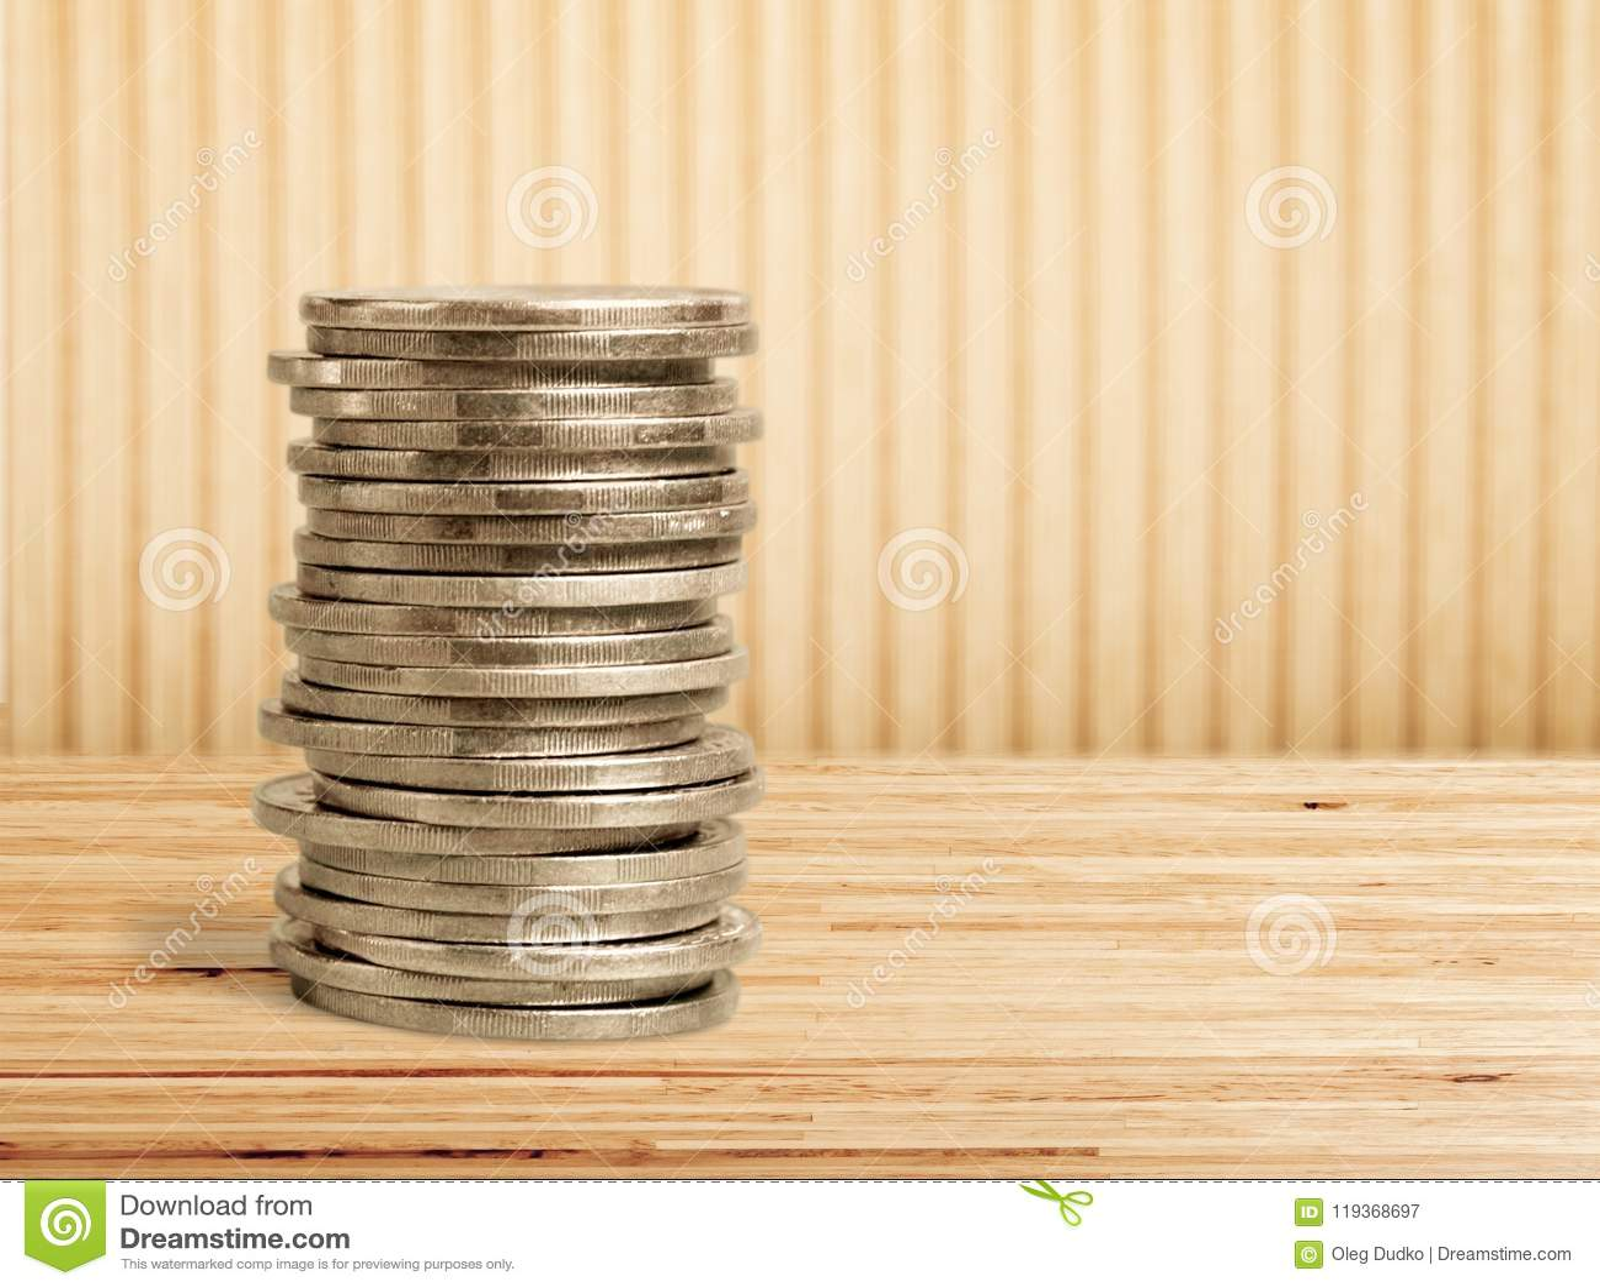 Pound Symbol Stock Image Image Of Finances Culture 119368697